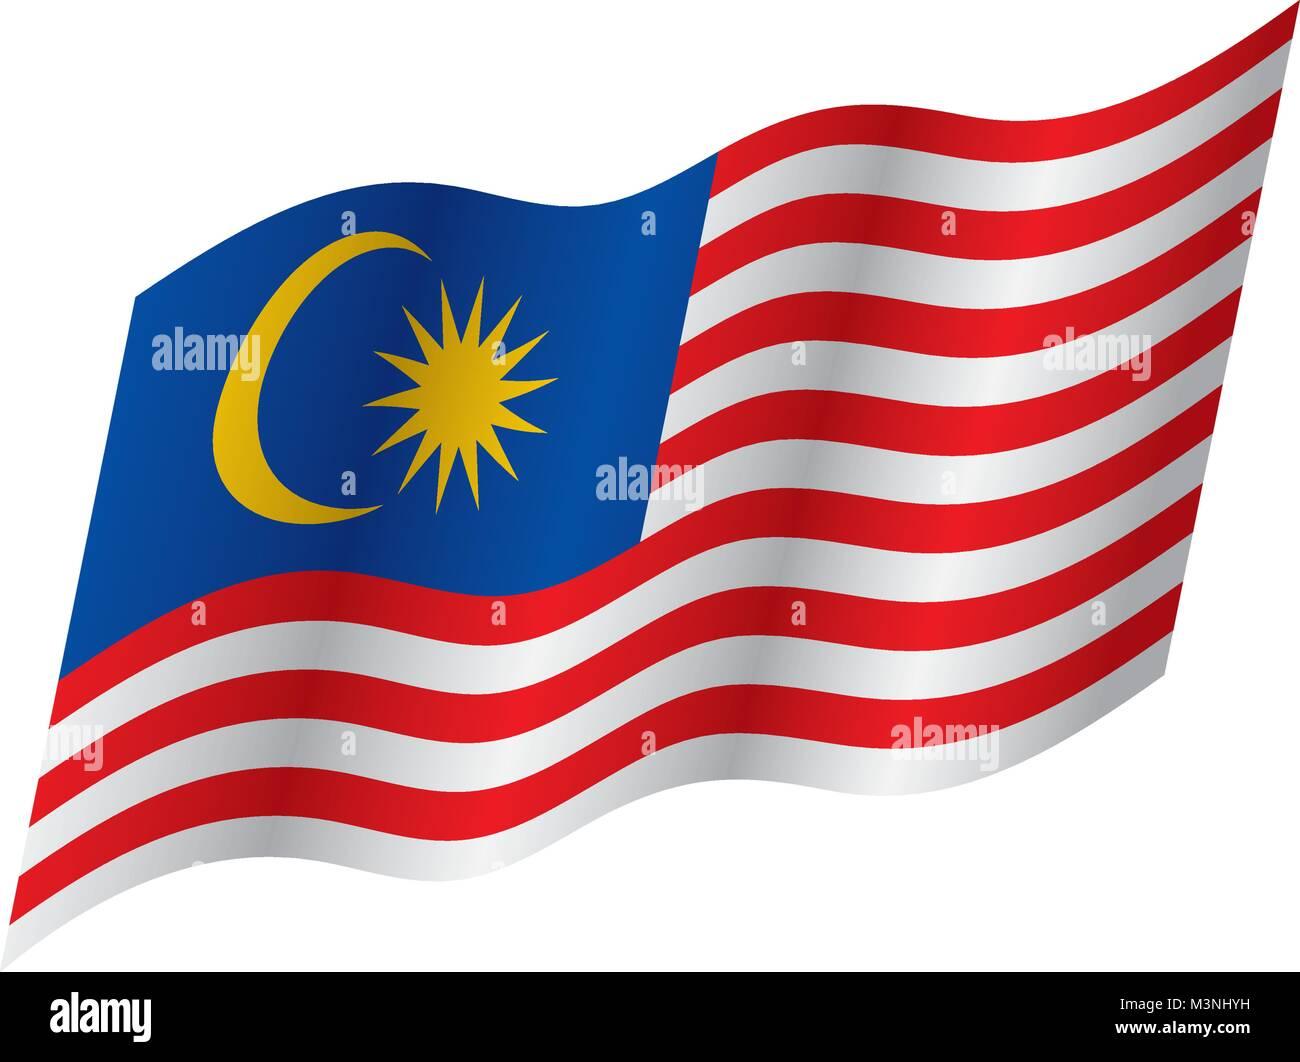 malaysia flag vector illustration stock vector art illustration rh alamy com flag vector free download